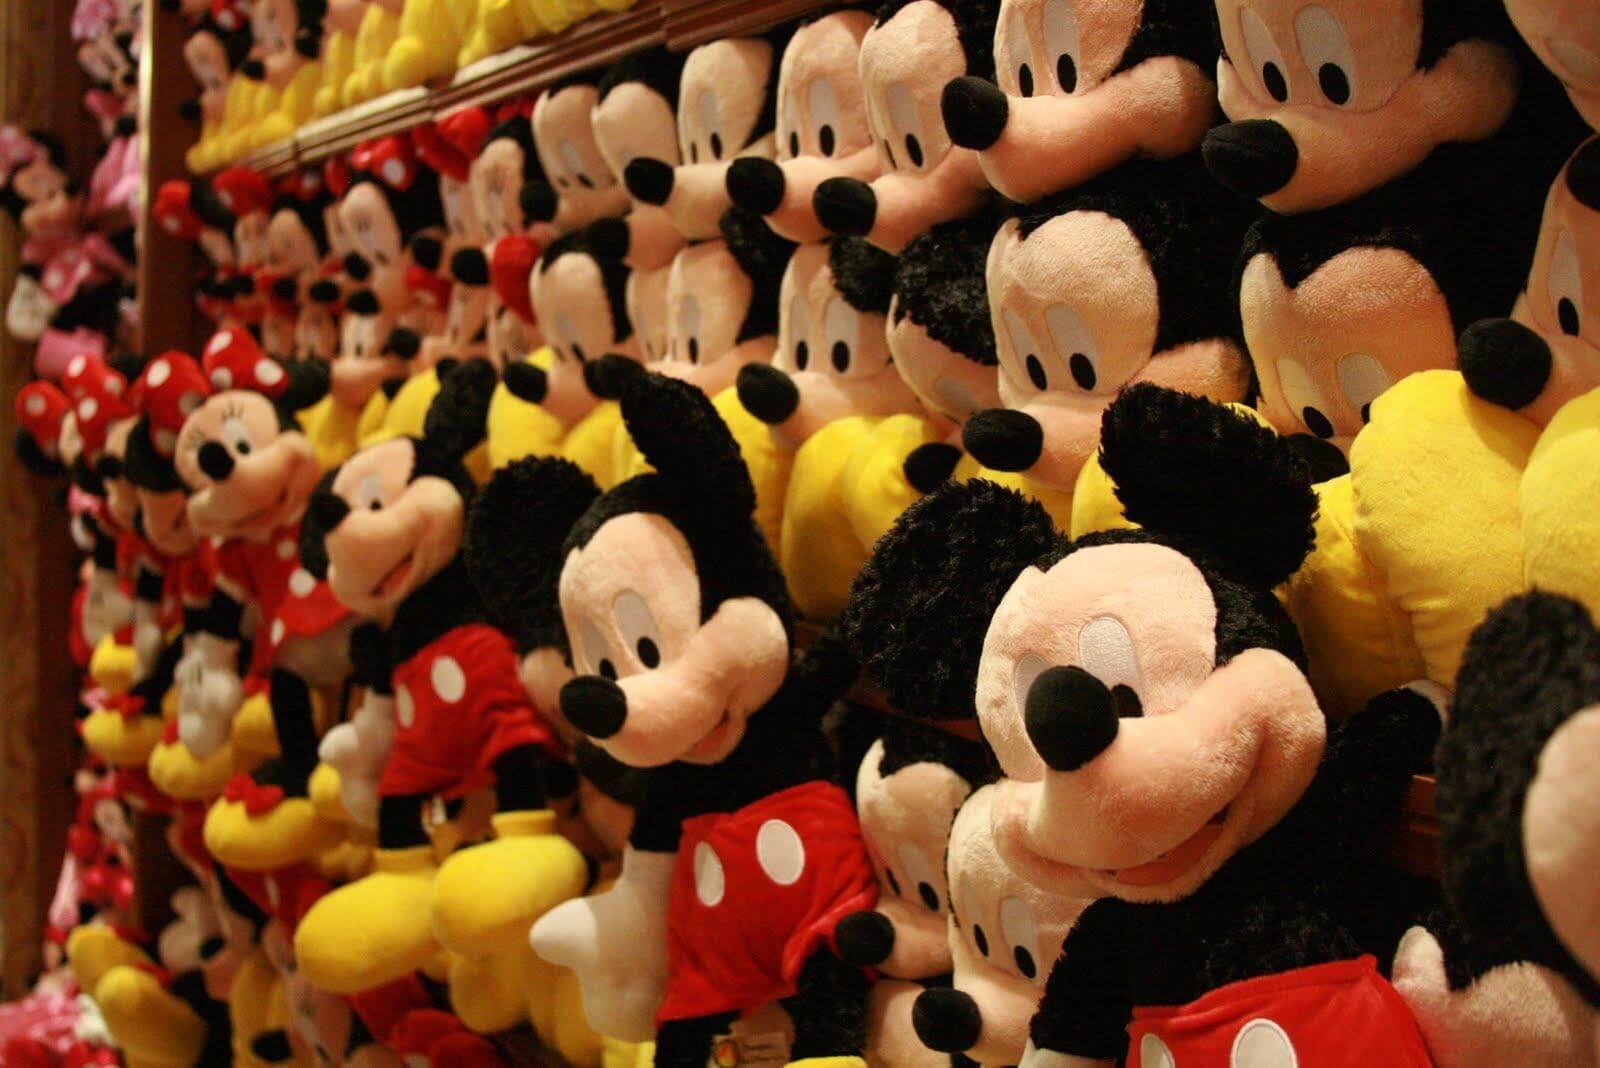 Souvenirs Disney